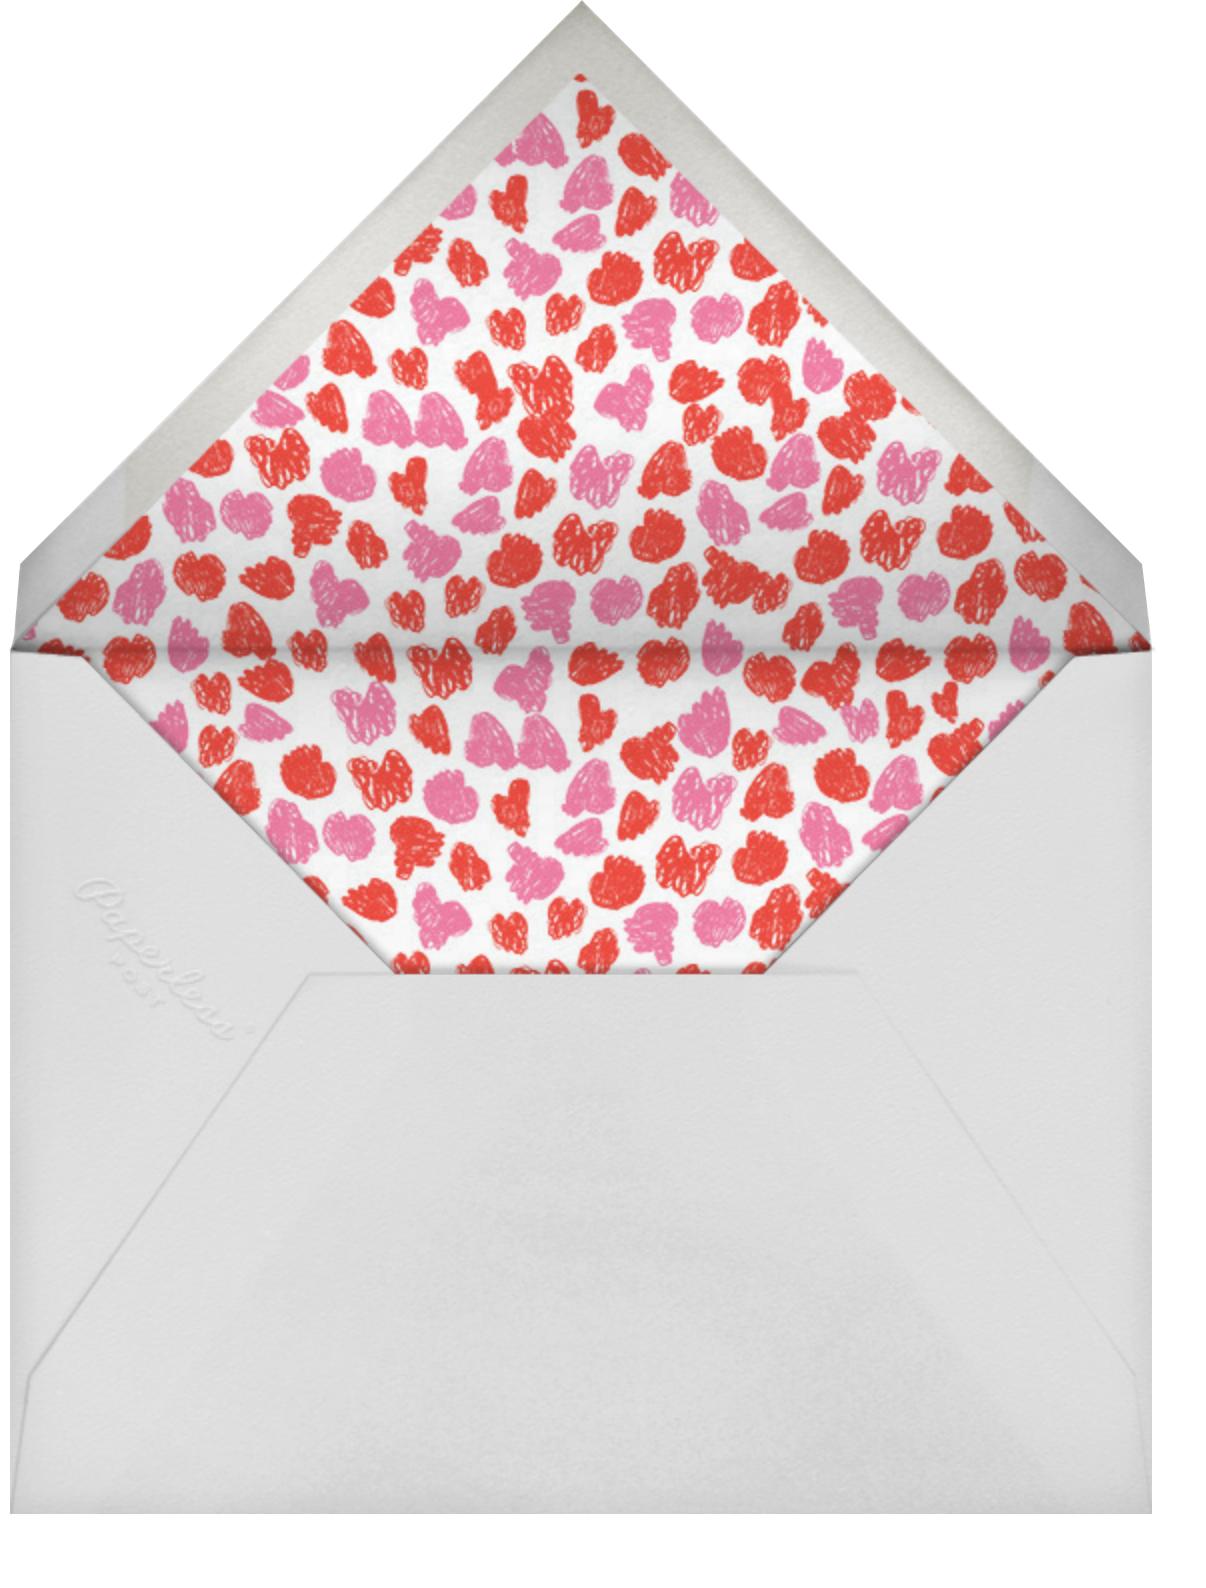 Glad You're Here - White - Mr. Boddington's Studio - Just because - envelope back